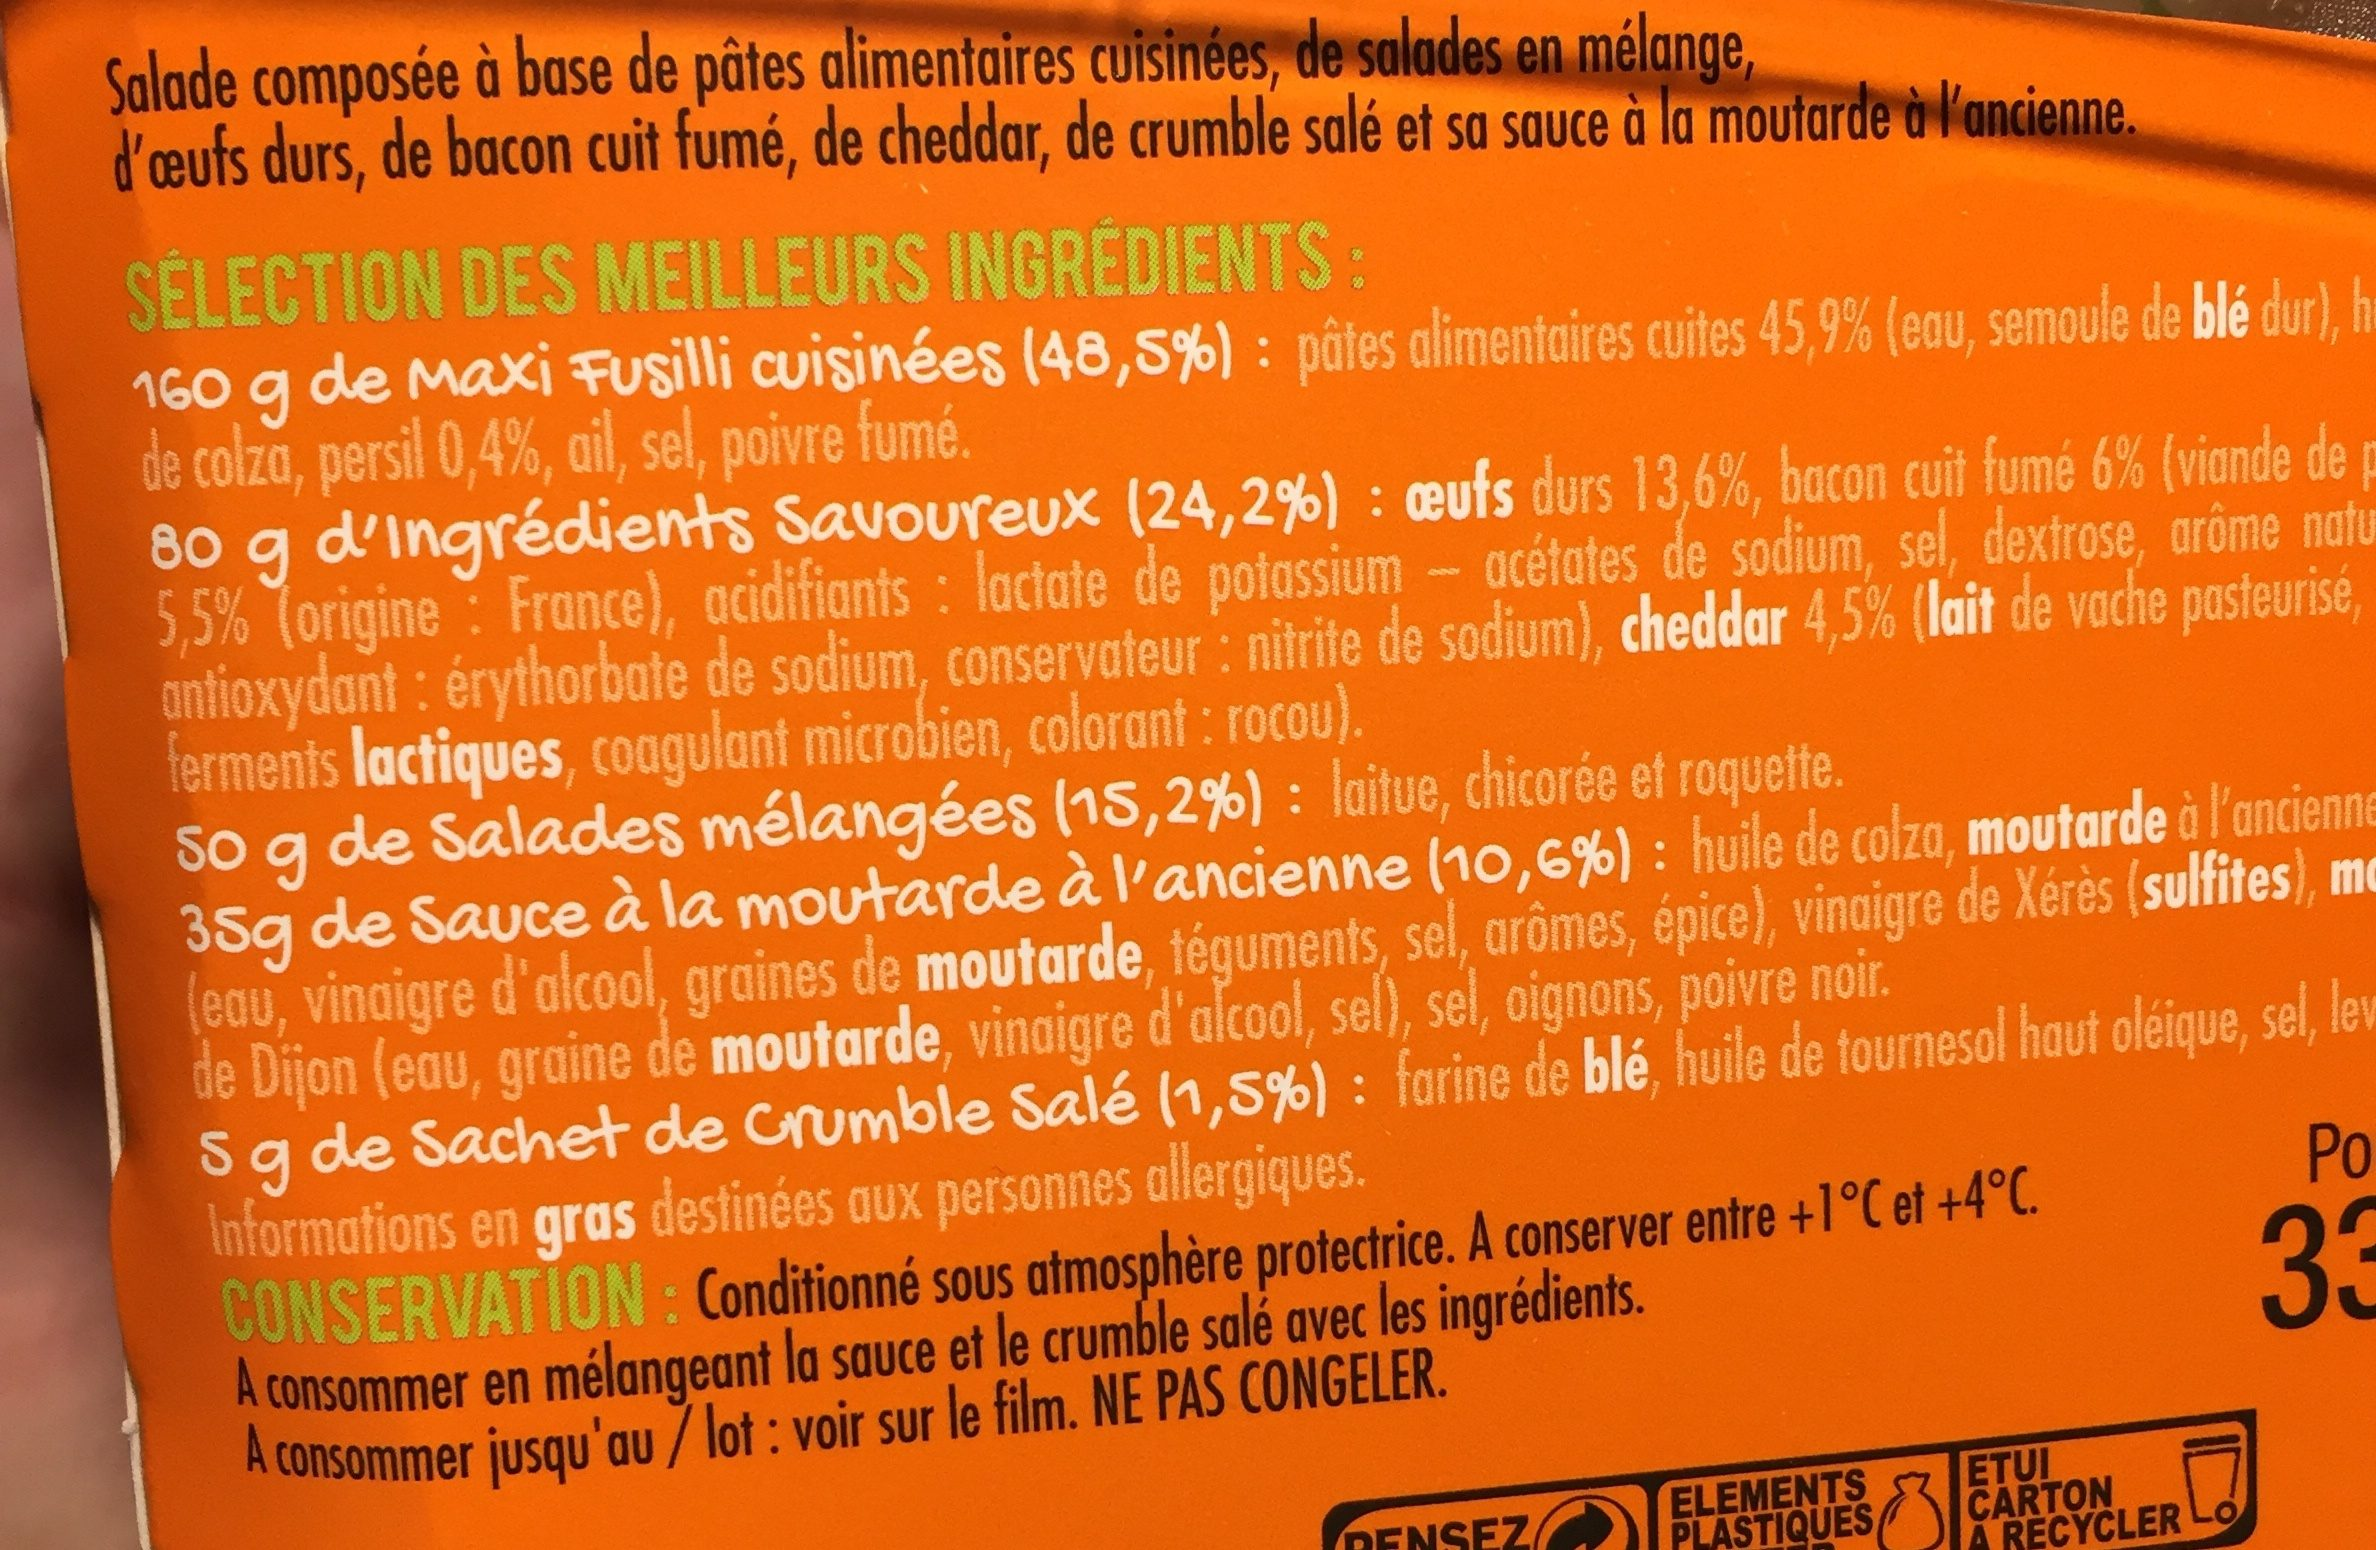 Extra Salade & Fusilli Bacon-Cheddar, 330g - Ingrédients - fr